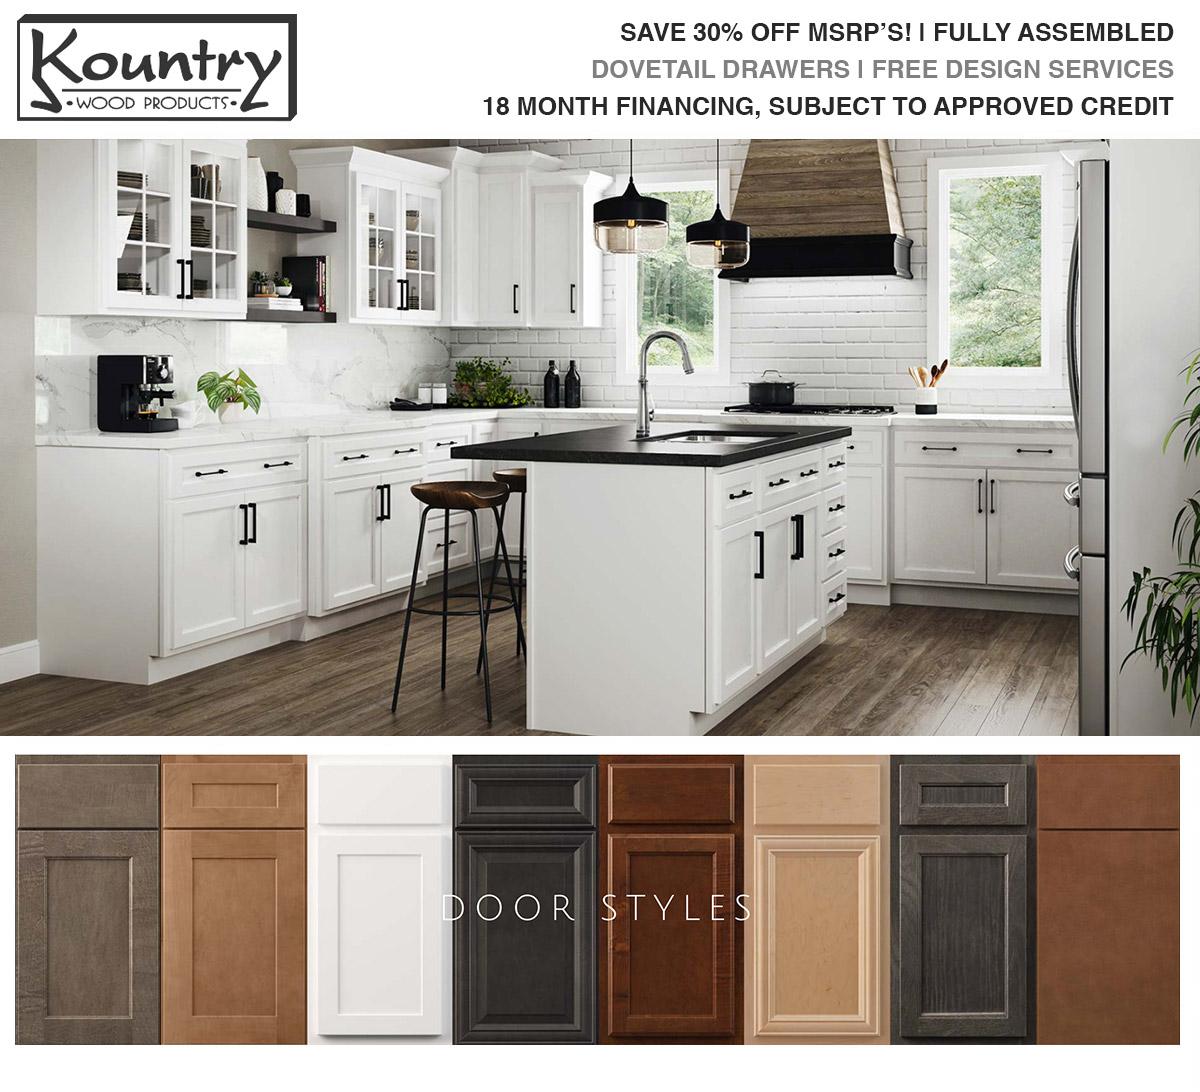 Kountrywood Cabinets